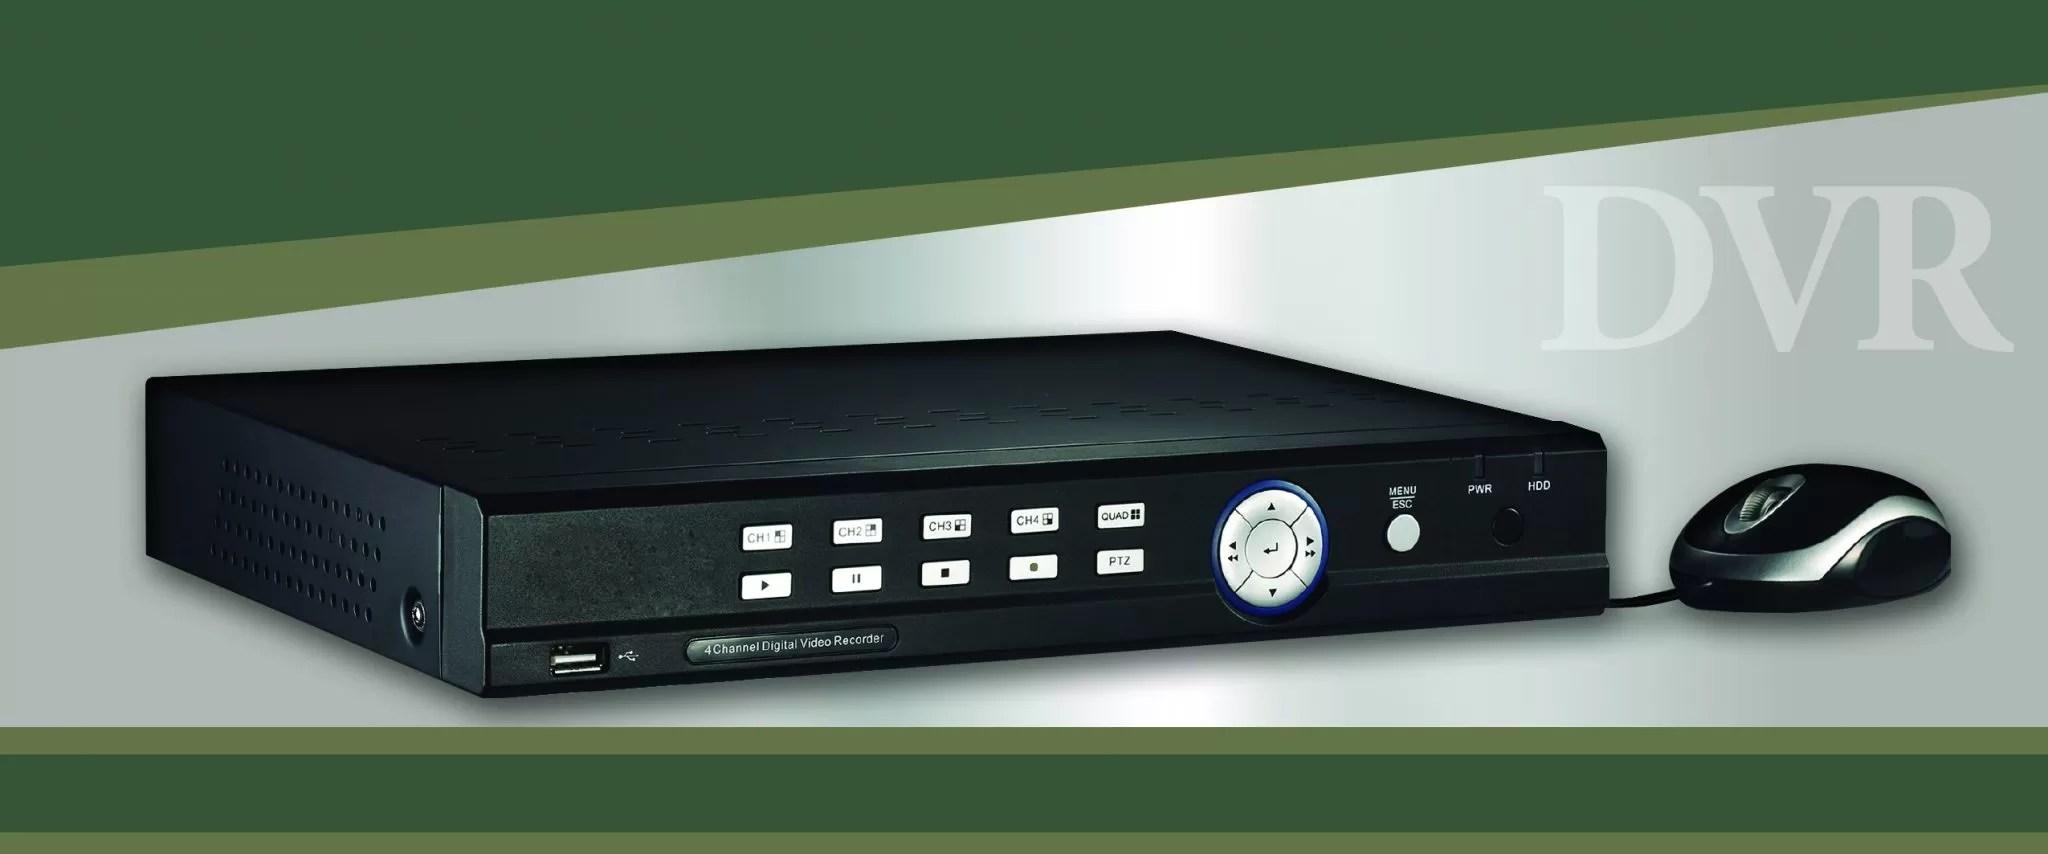 DVR - Security Digital video recorder System